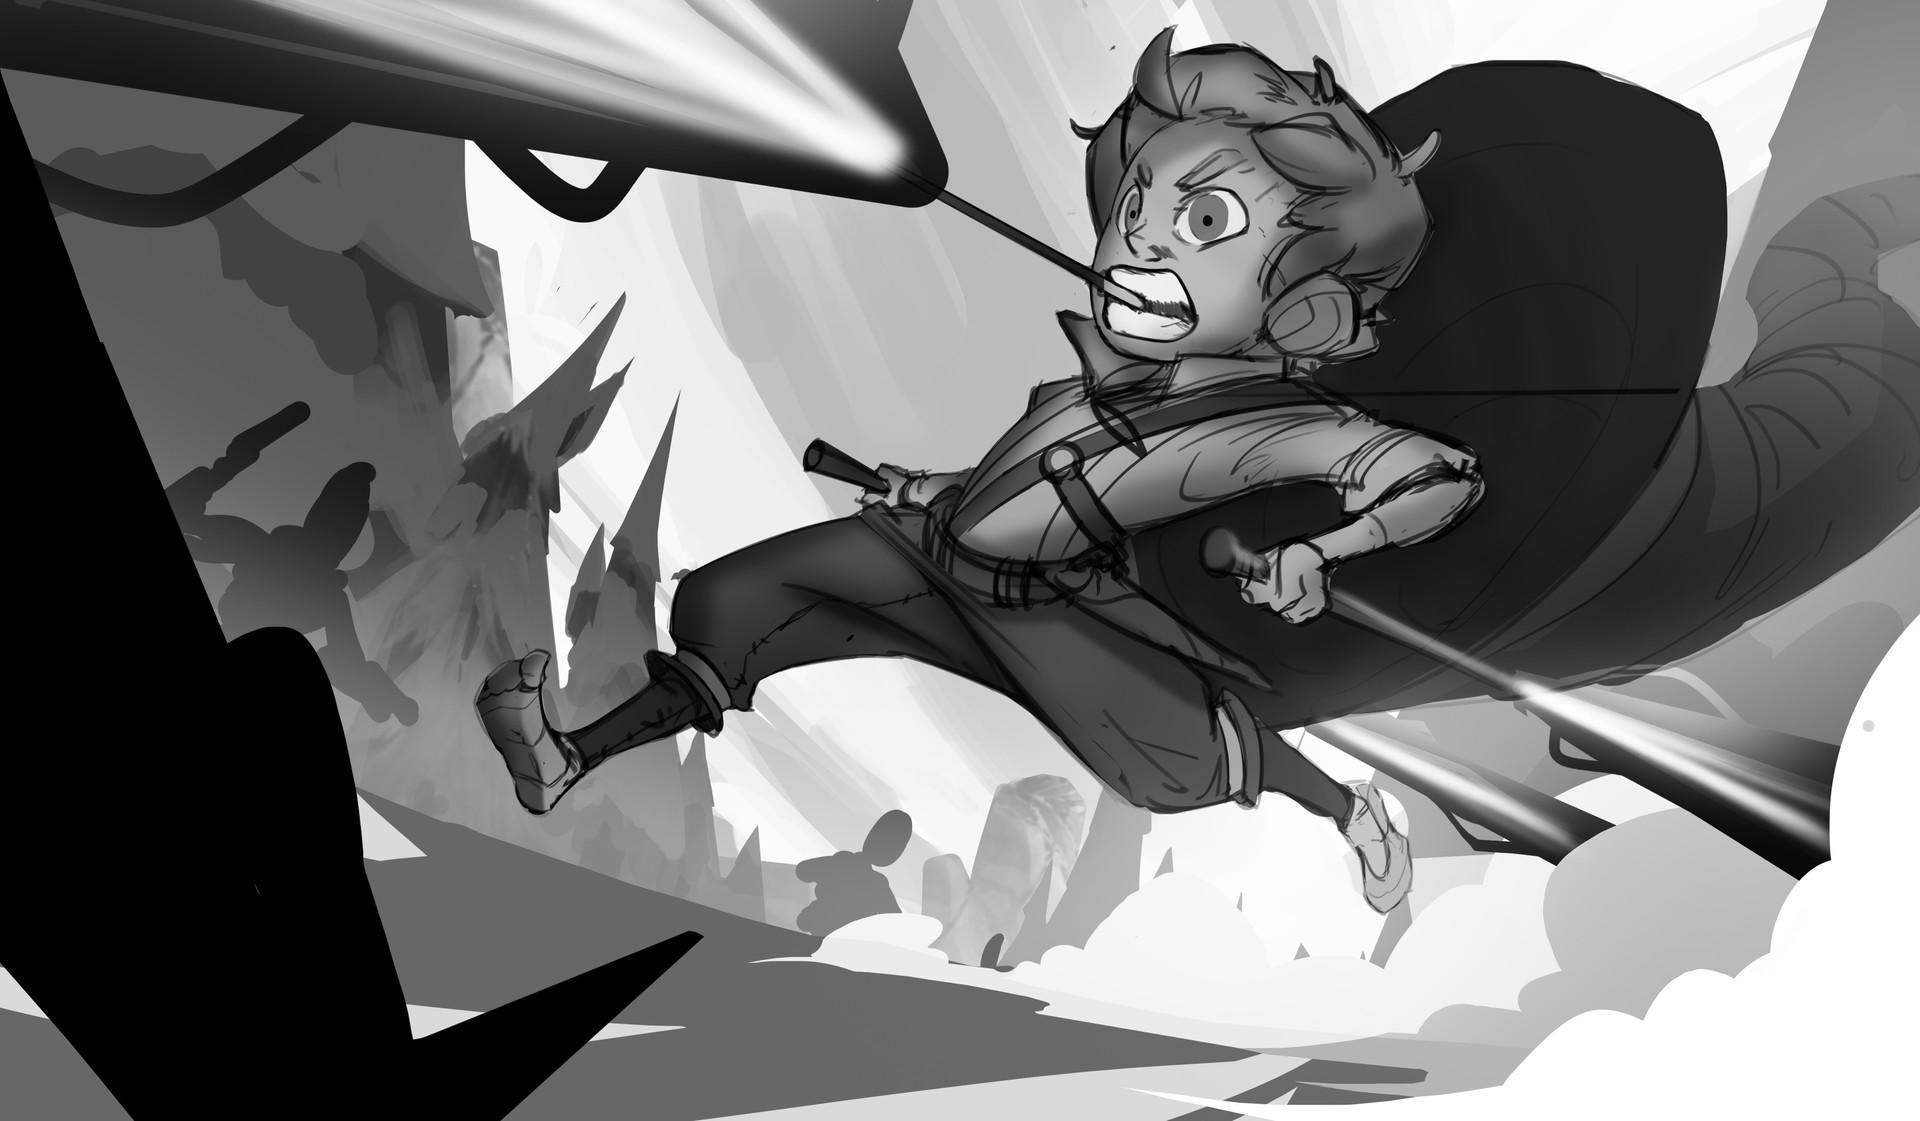 Corey shillingford art war contest illustration 05